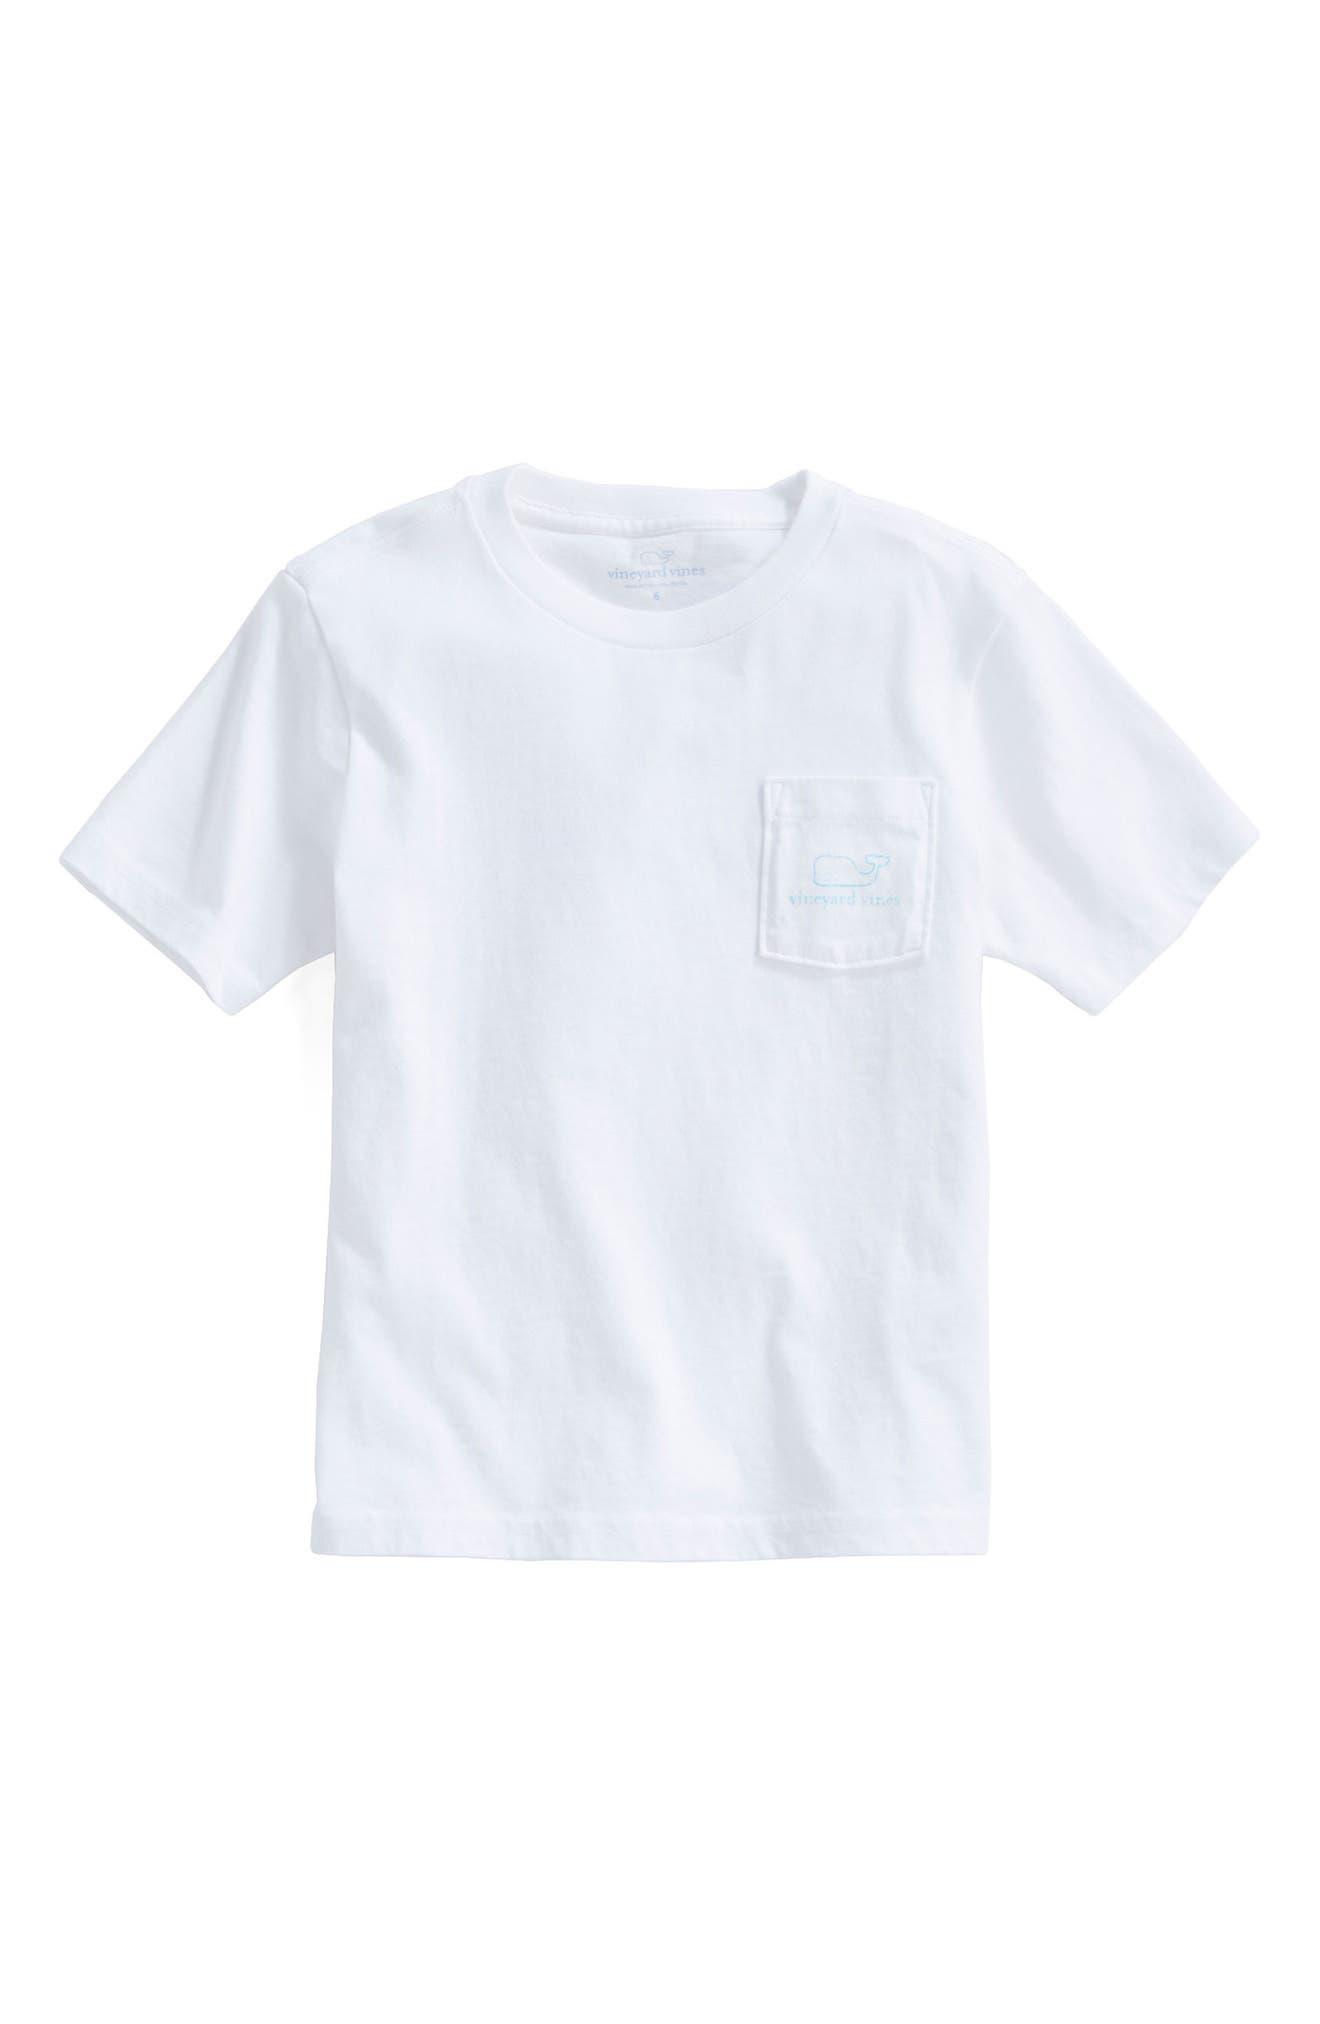 Whale T-Shirt,                             Alternate thumbnail 3, color,                             WHITE CAP